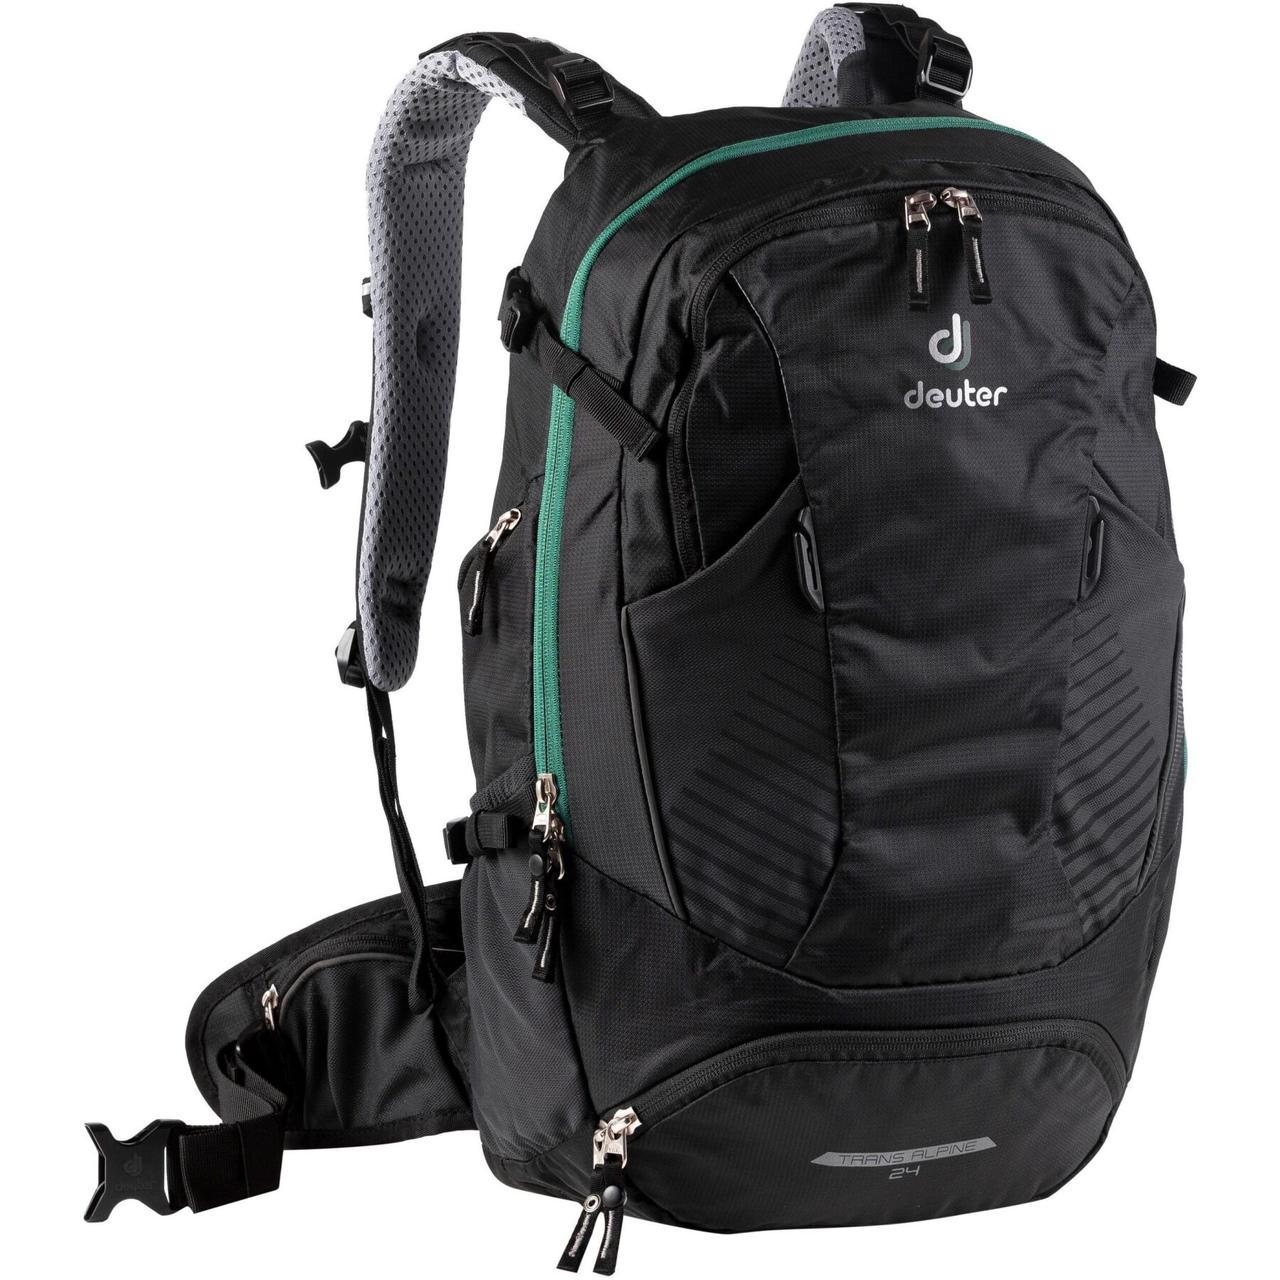 Велорюкзак Deuter Trans Alpine 24 black (3205020 7000)